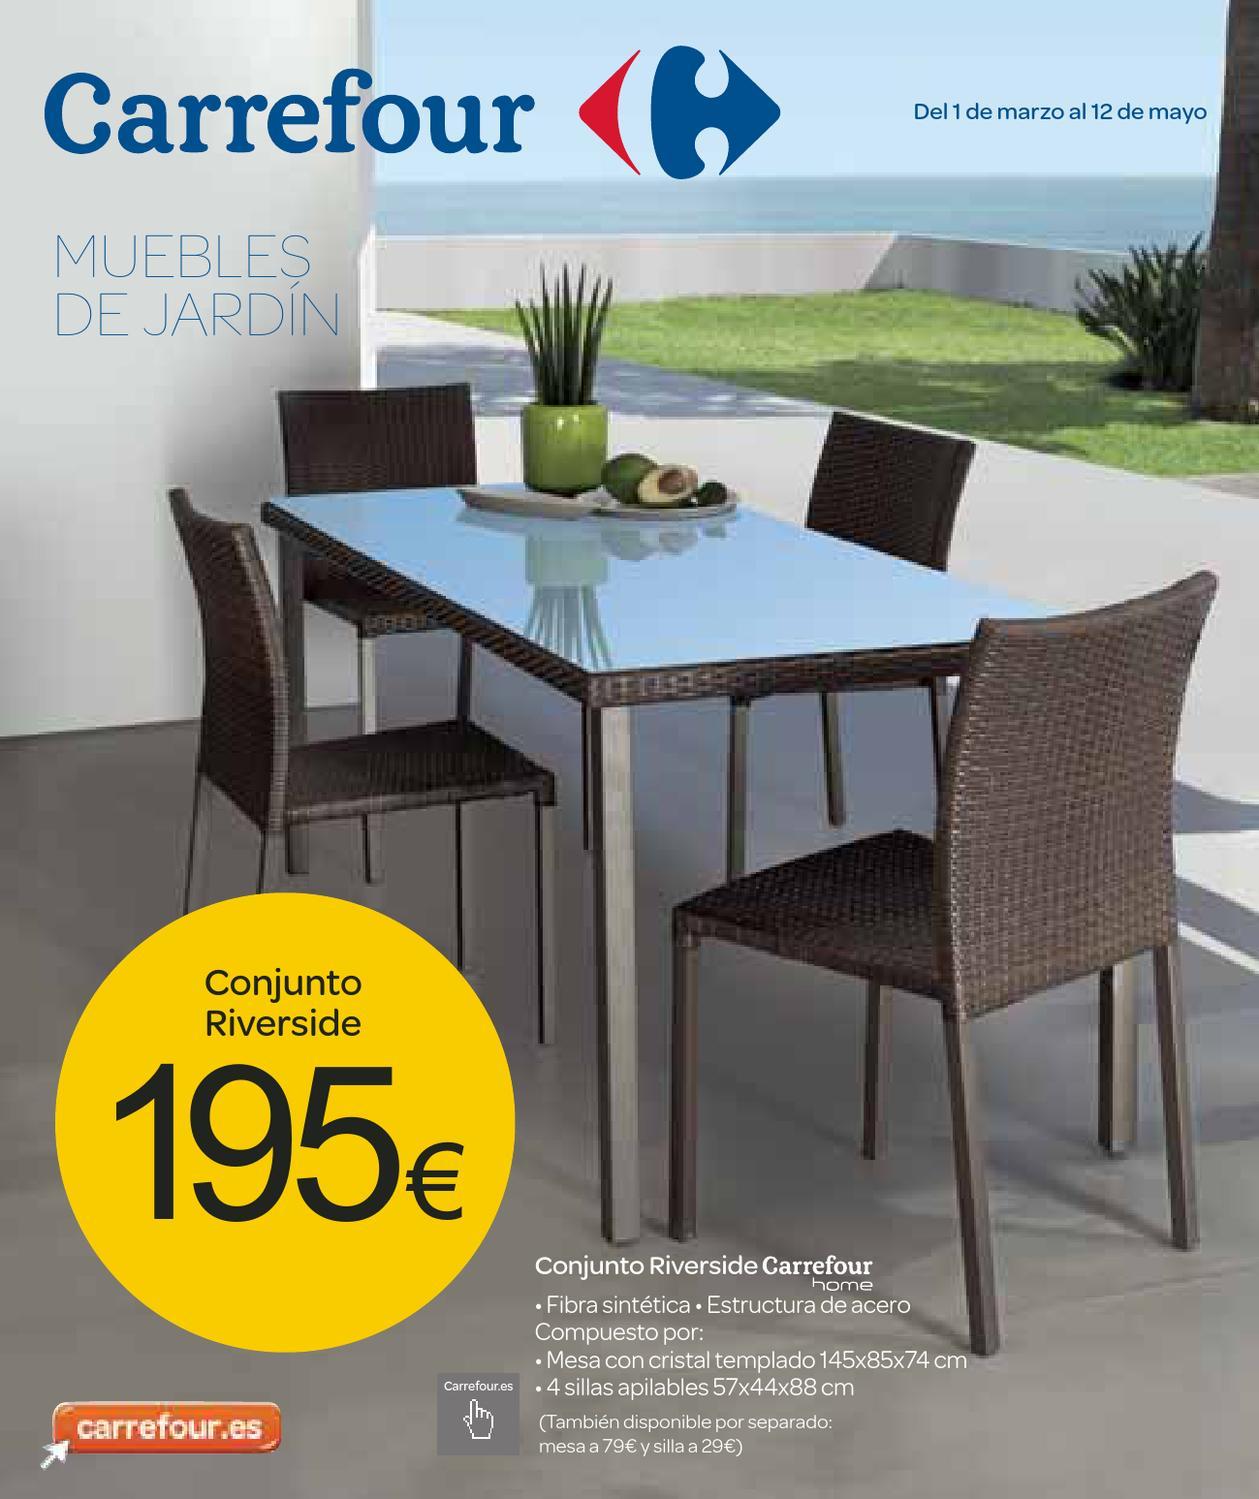 Catalogo de muebles de jardin carrefour 1 de marzo al 12 for Juego de jardin carrefour